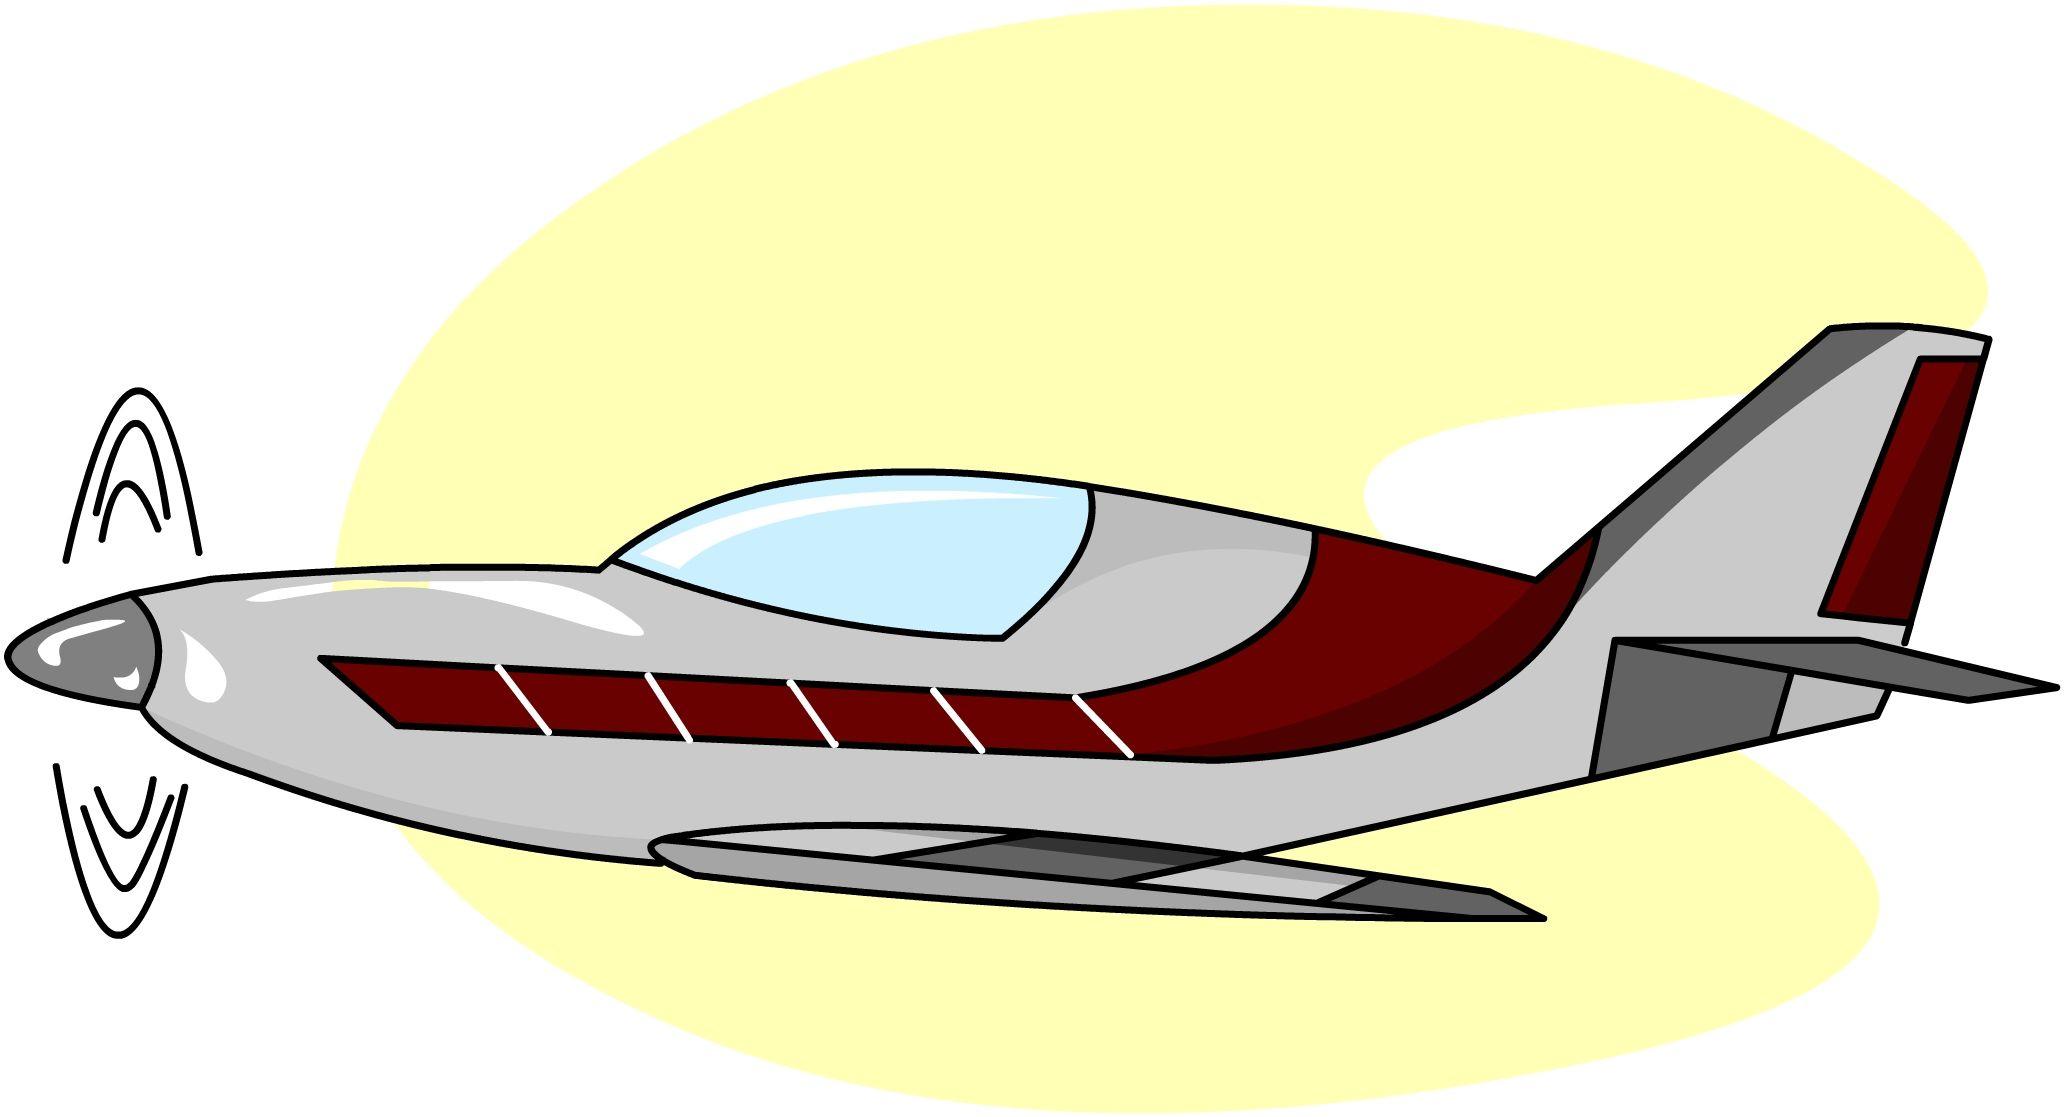 Aviation clipart Clipart Clipart Free Panda aviation%20clipart